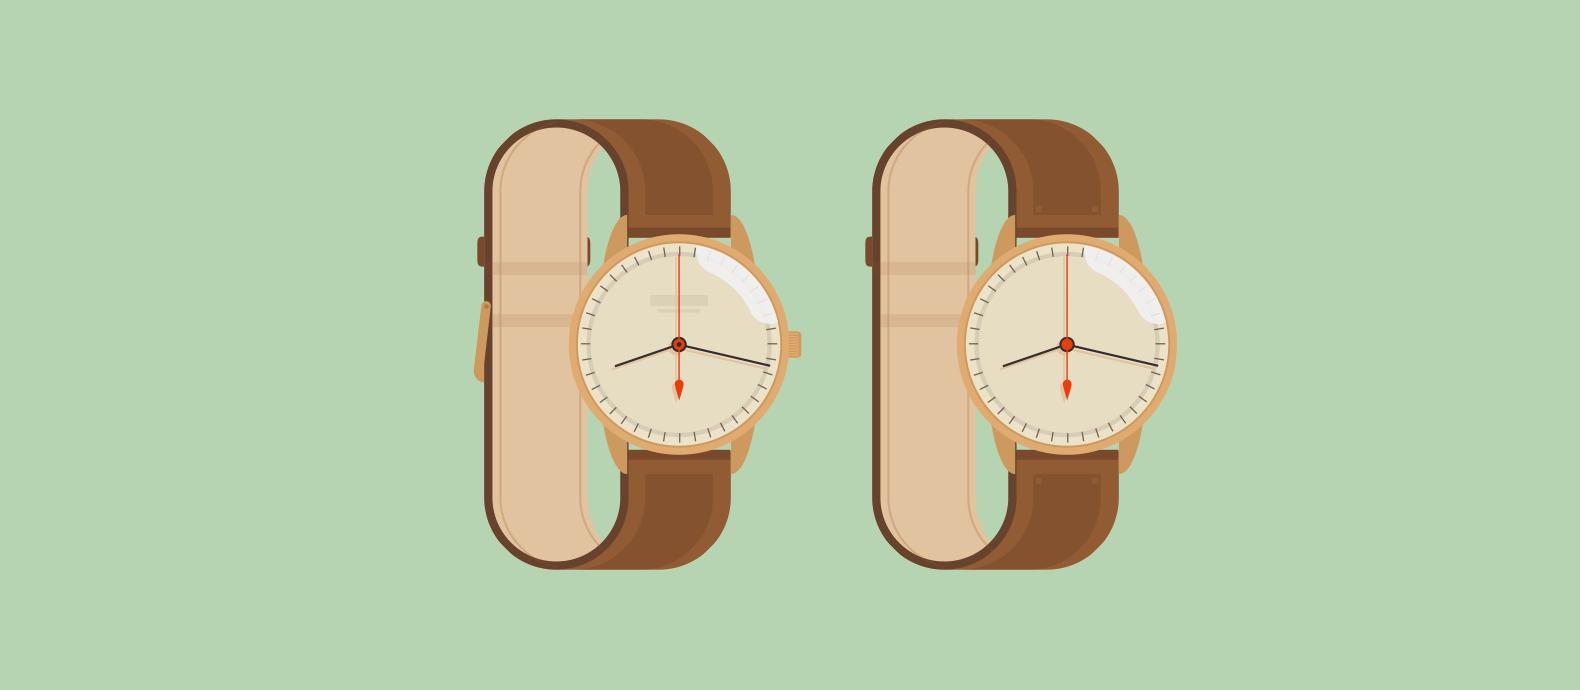 Fake watches